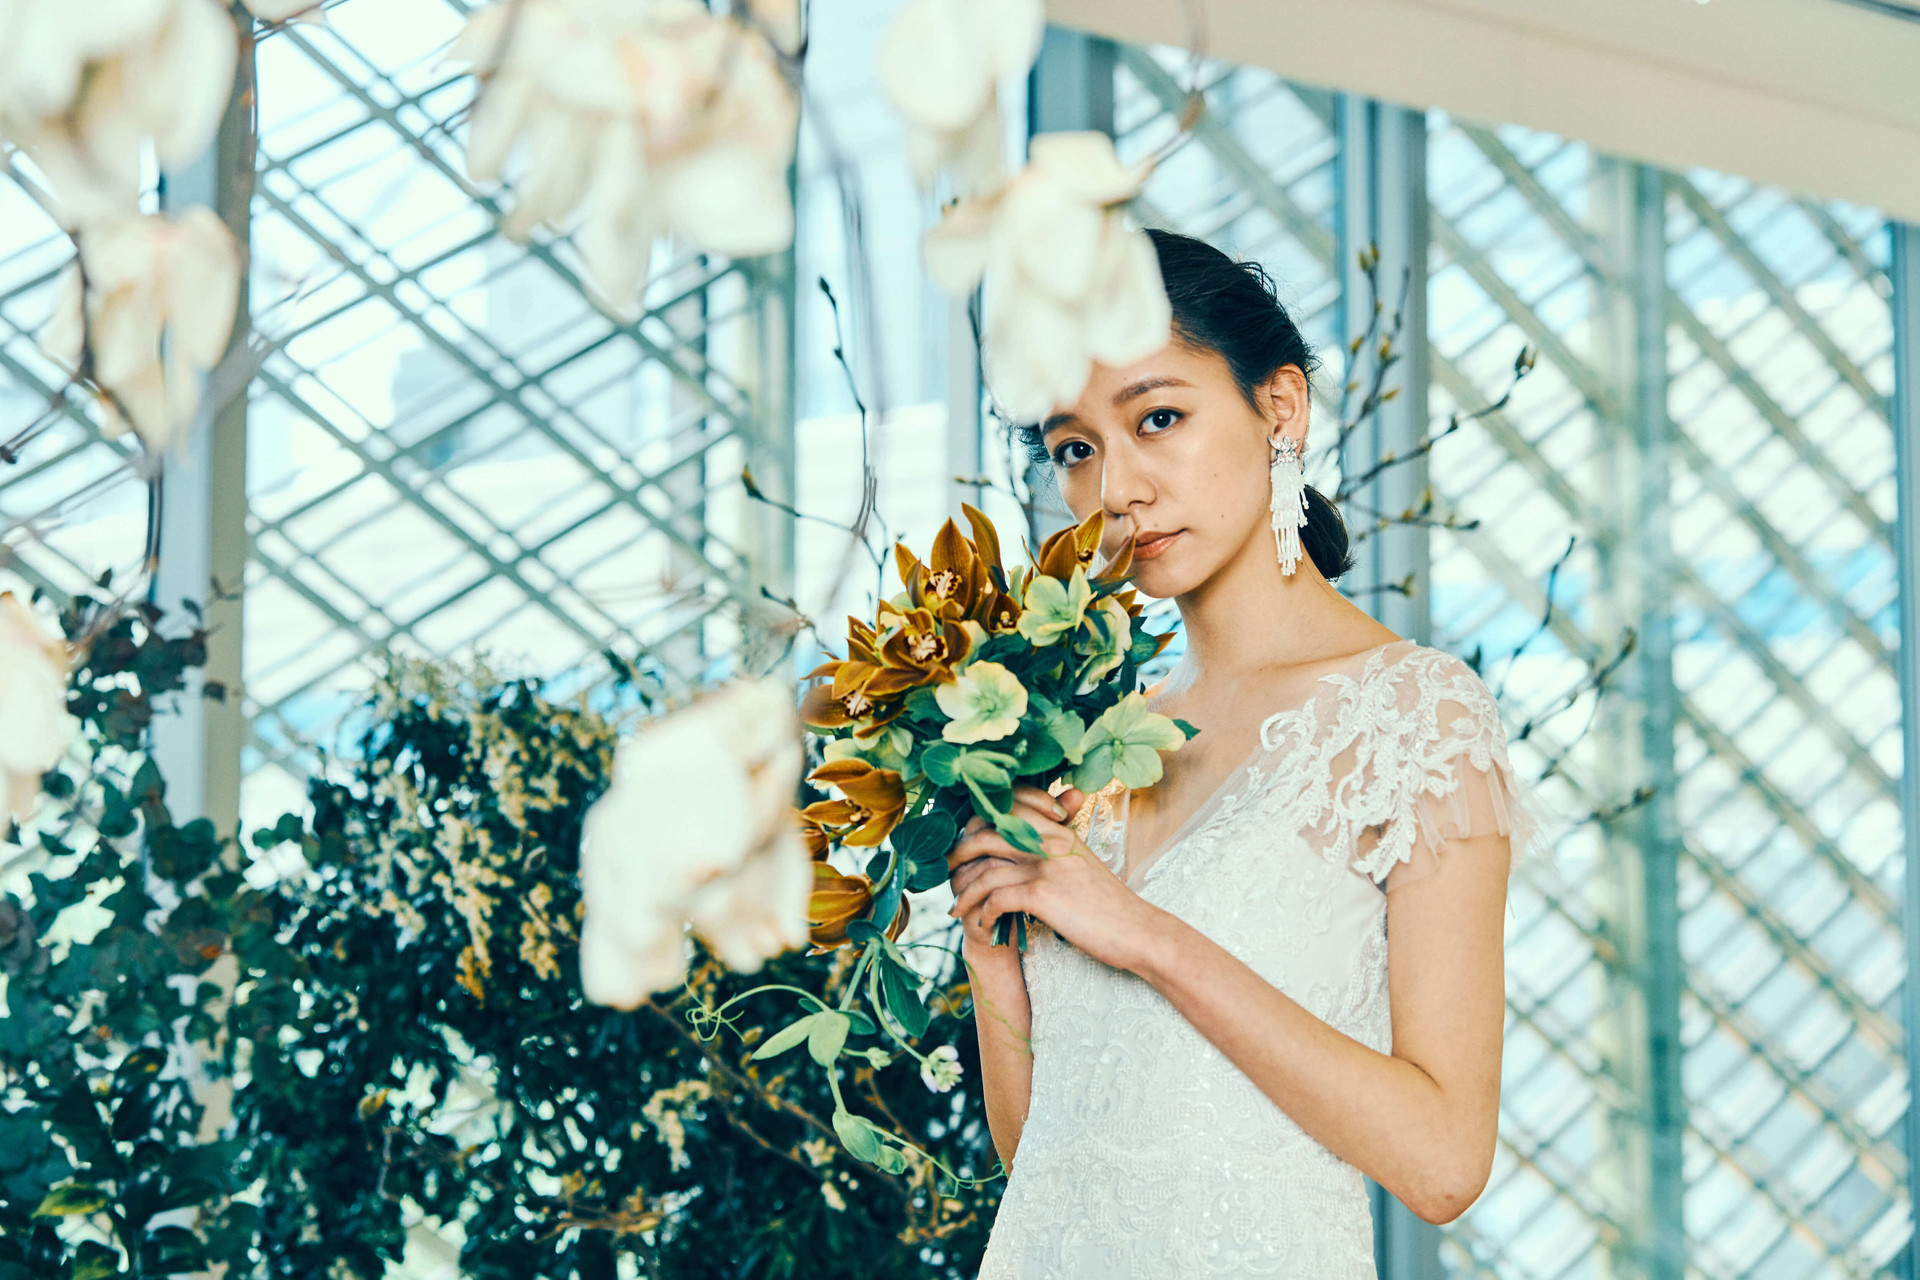 SANAPU_wedding_201903131759.jpg